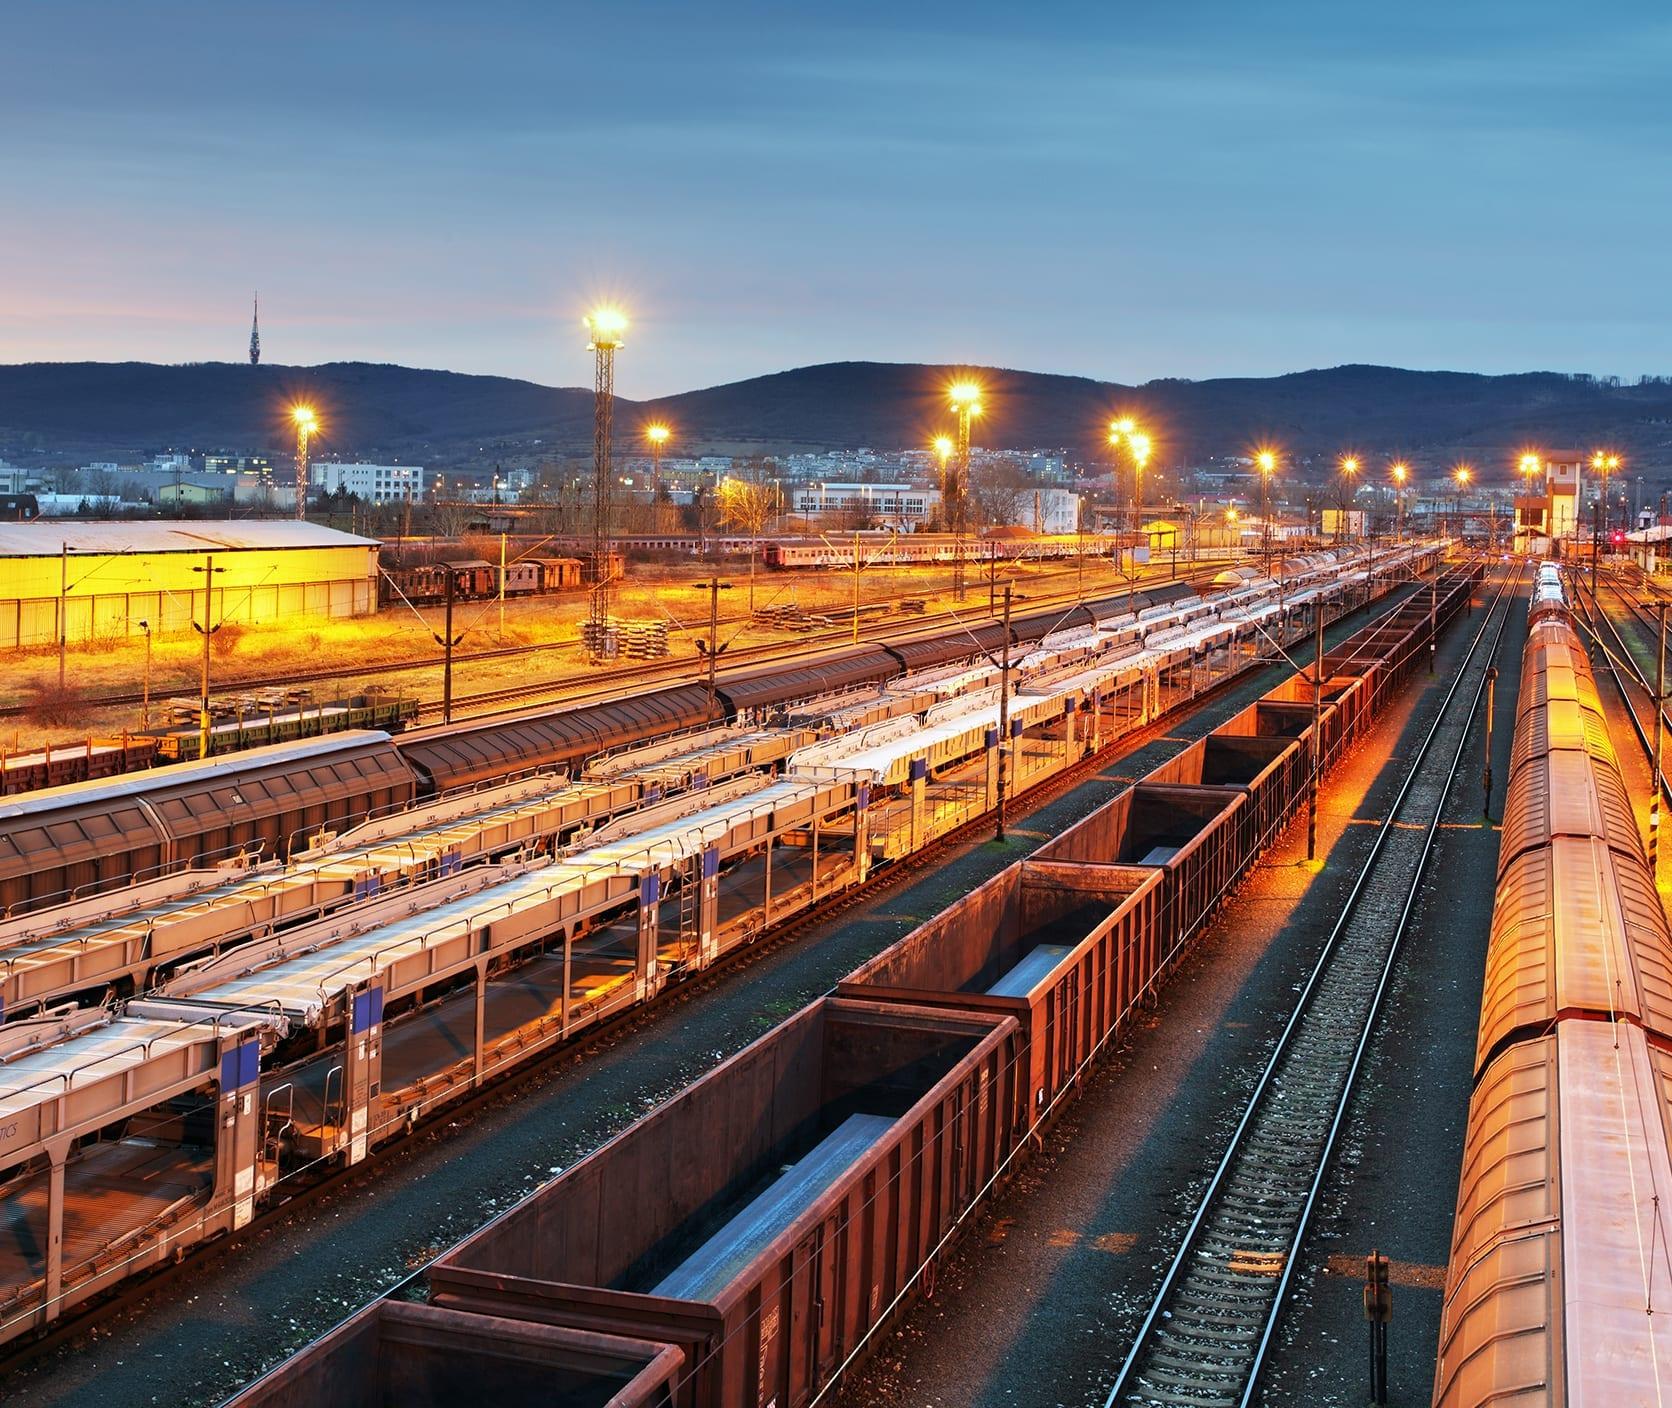 rail cars in a train yard